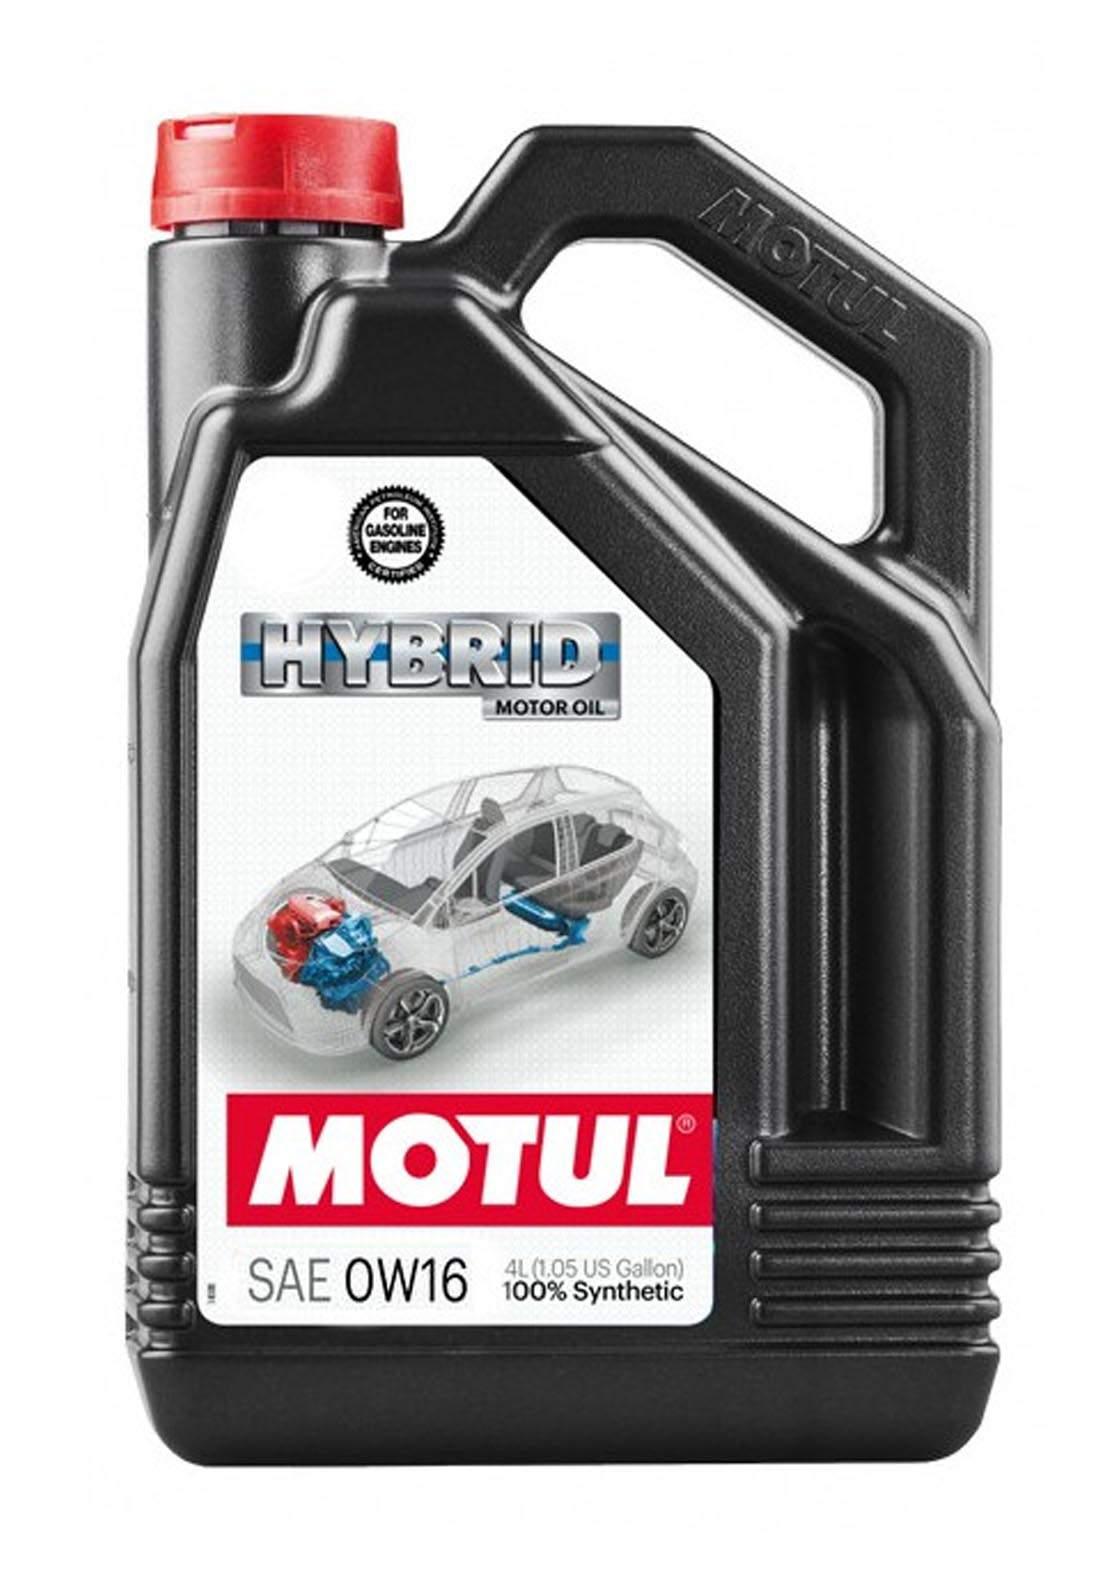 Motul 0w16 Hybrid 100% Synthetic Oil 4L  زيت تخليقي 100% للسيارات